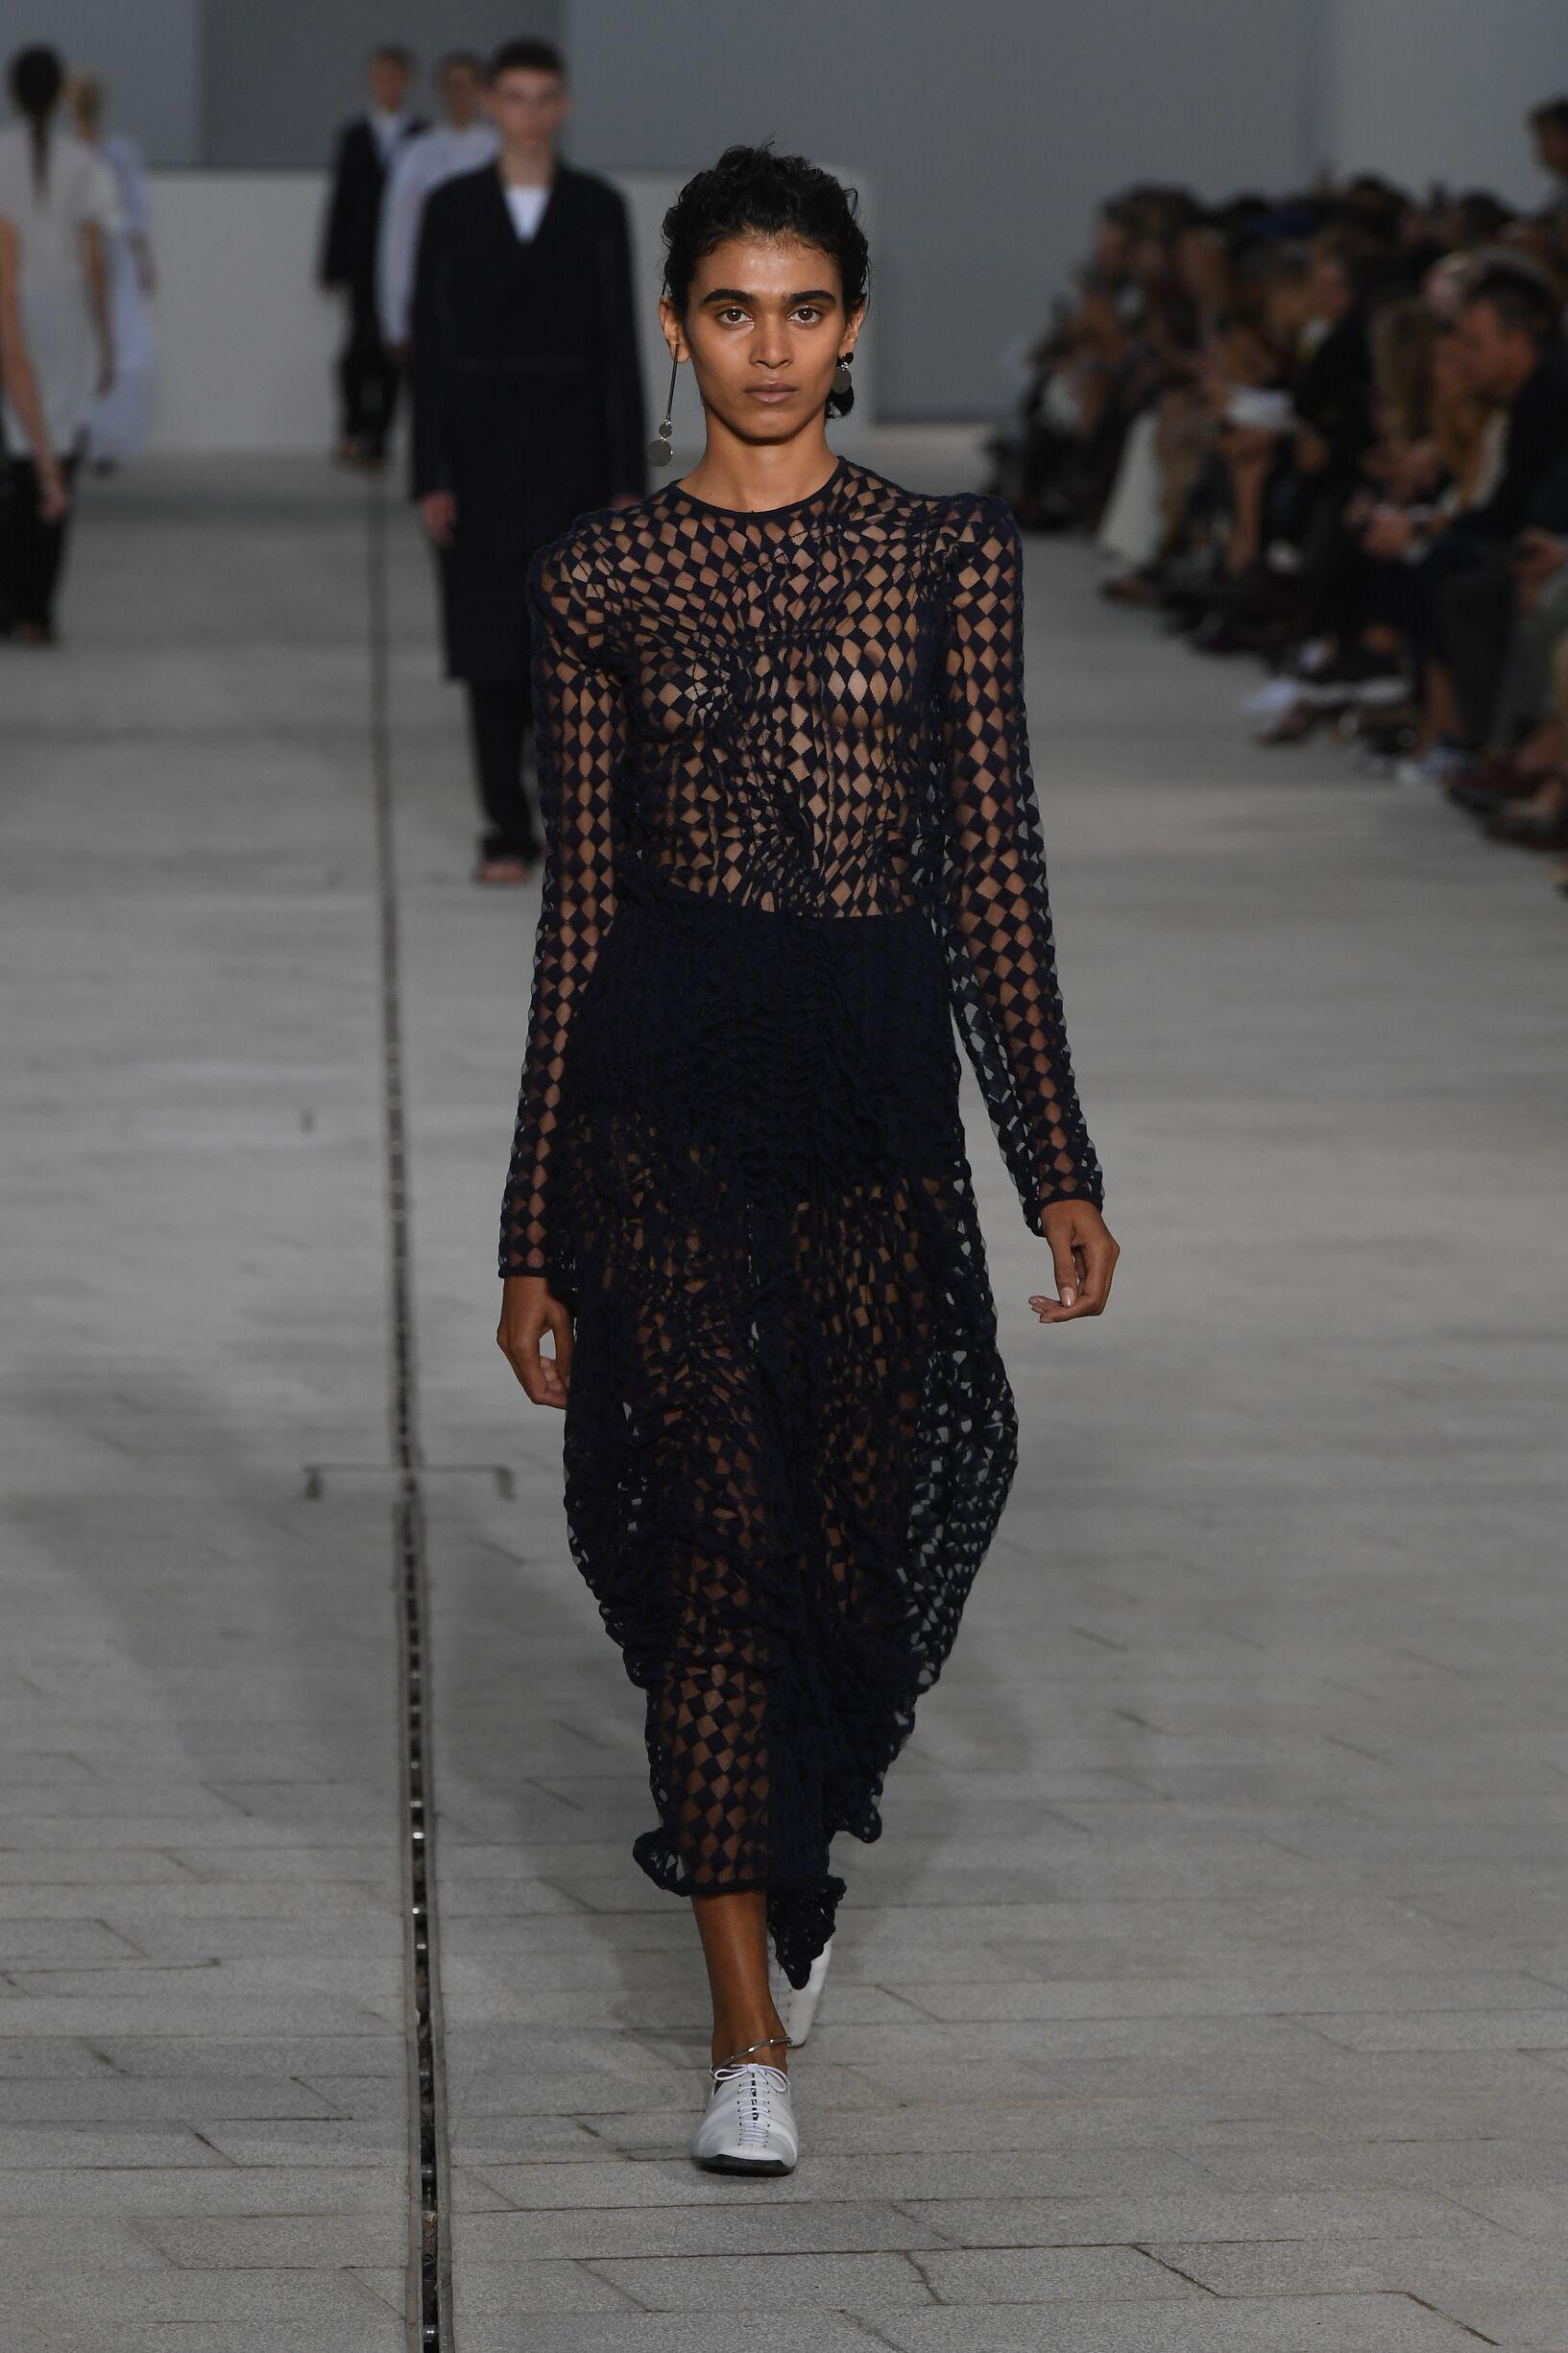 Jil Sander SS 2018 Womenswear